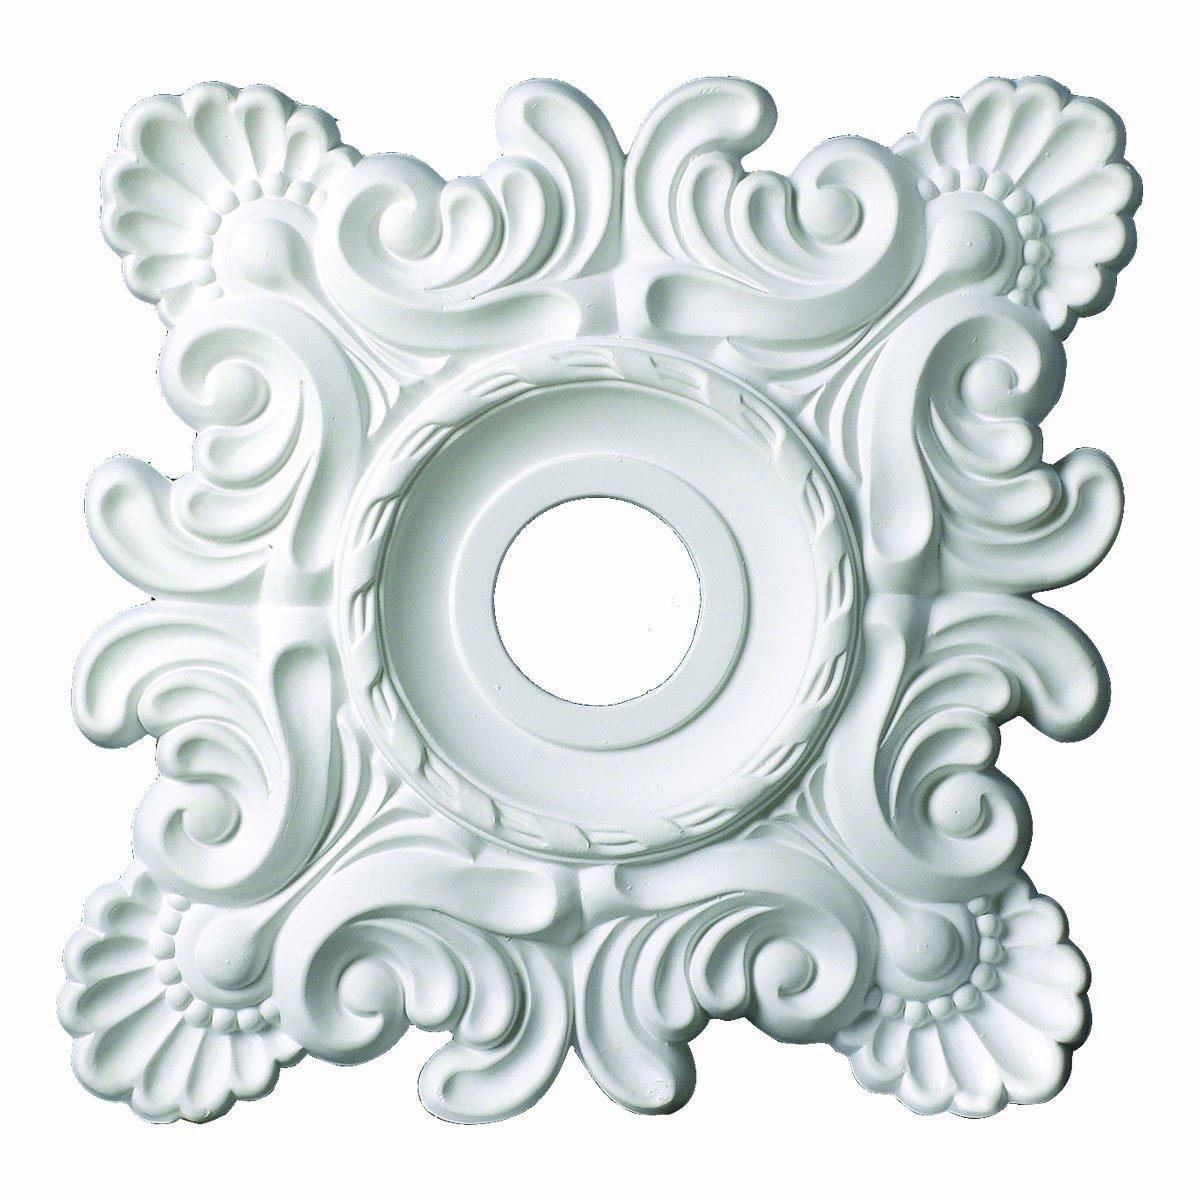 18 Inch Square Ceiling Medallion 3 5/8'' ID White Primed Polyurethane #537 By Designer's Edge Millwork